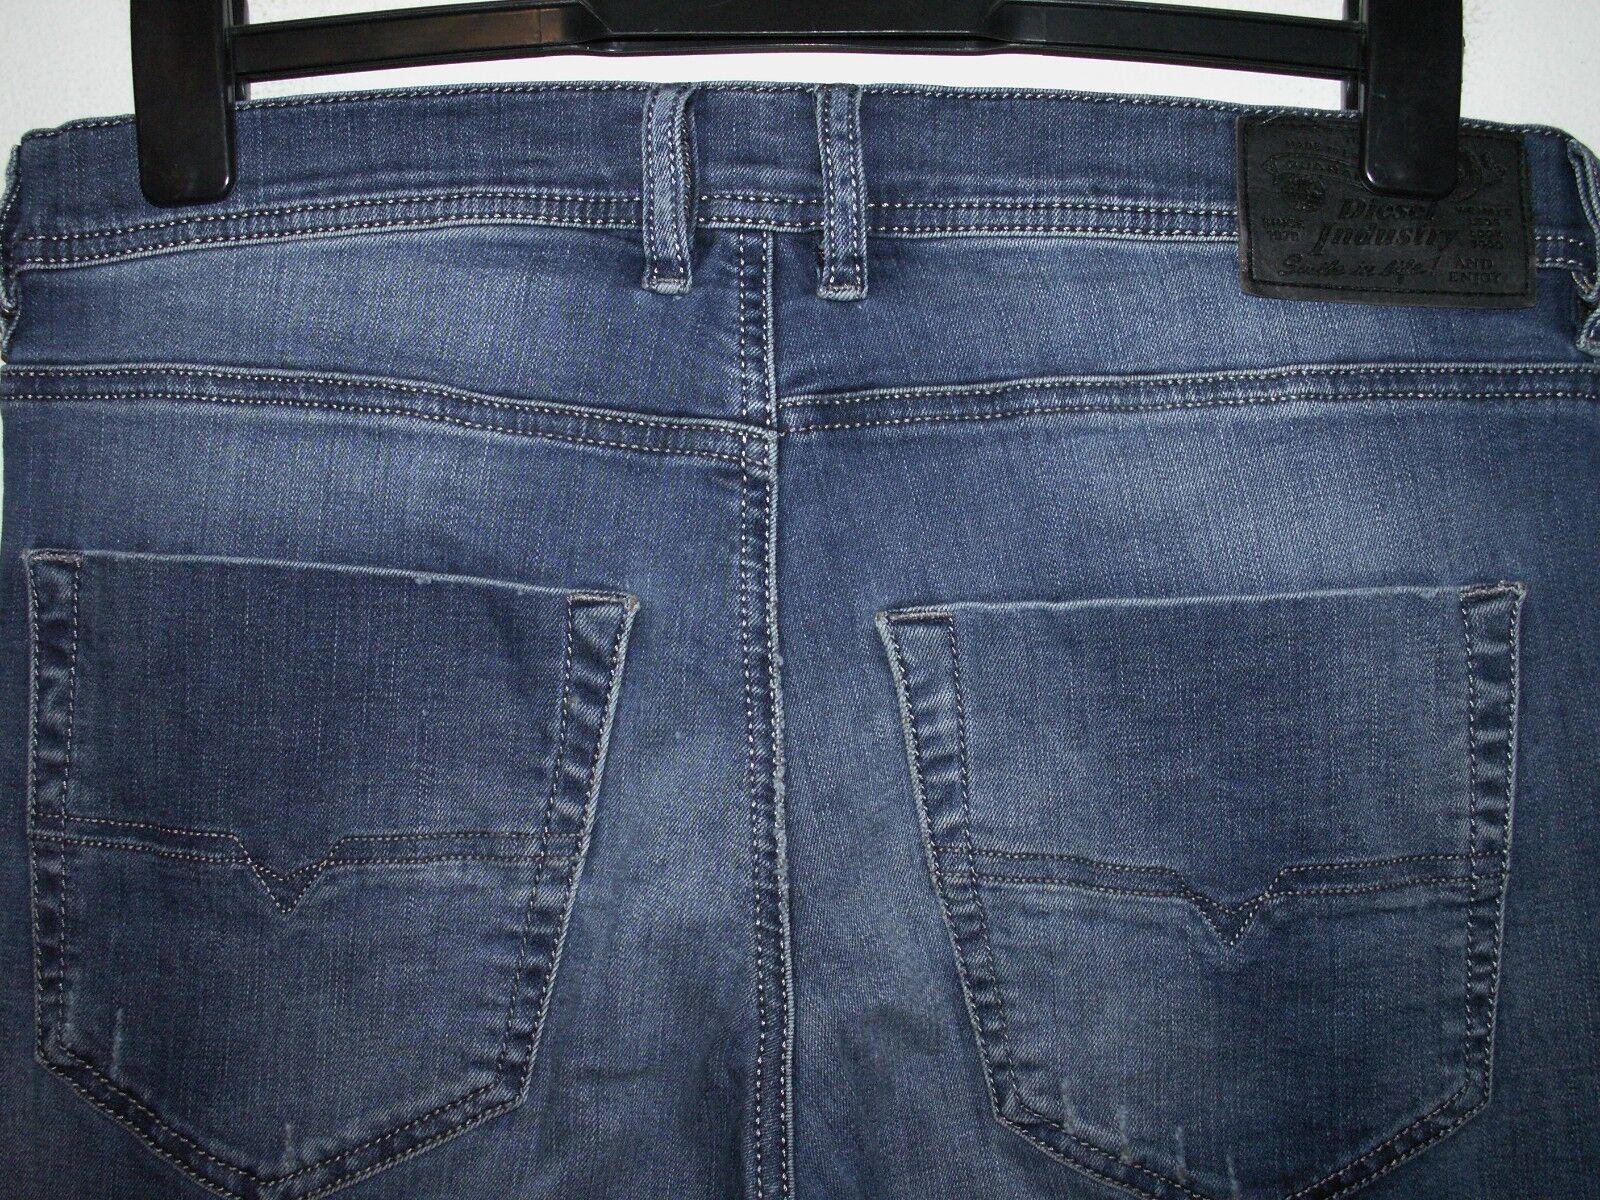 Diesel tepphar slim-carred fit jeans wash 0R605 stretch W31 L32 (a3799)